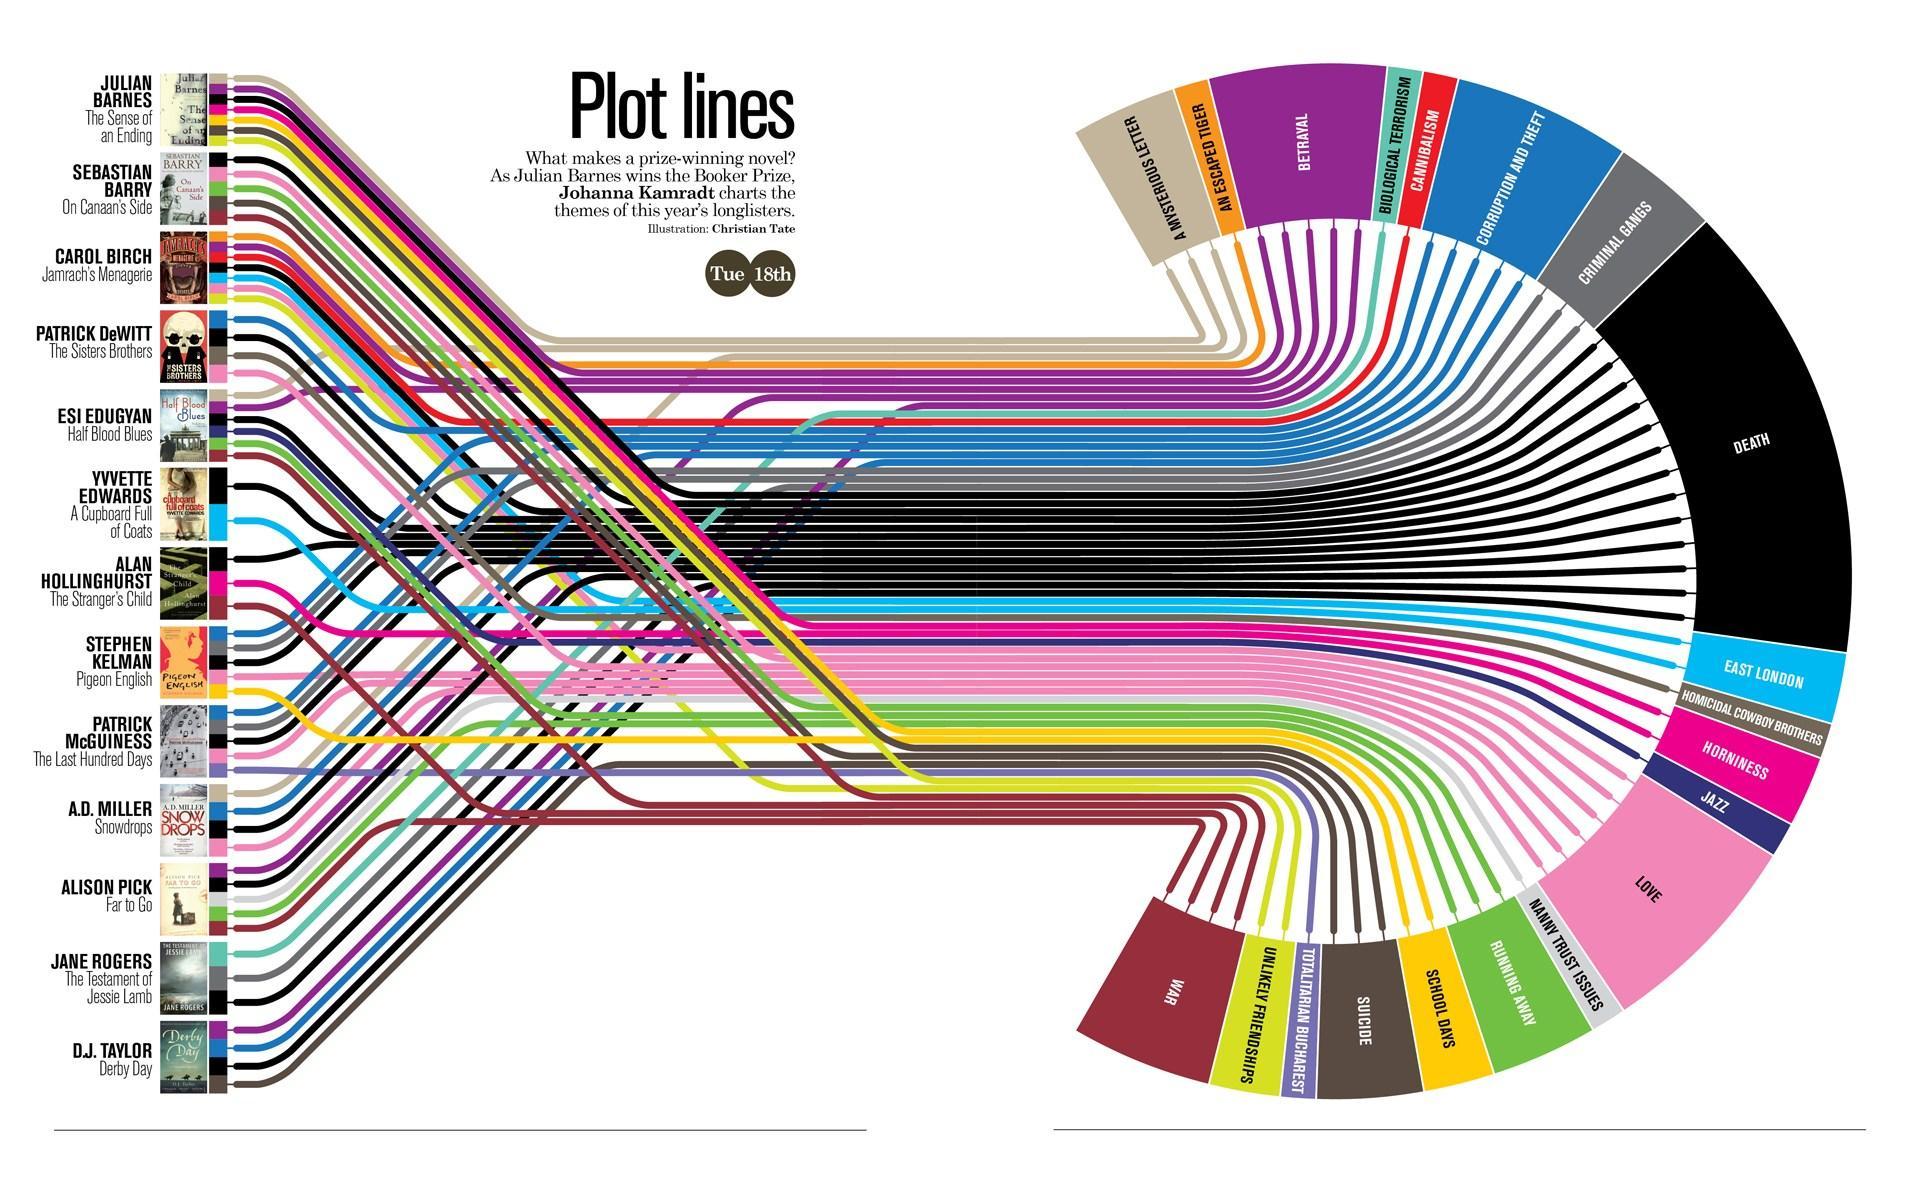 Plot-lines-1-1920-x-11821.jpg (1920×1182)